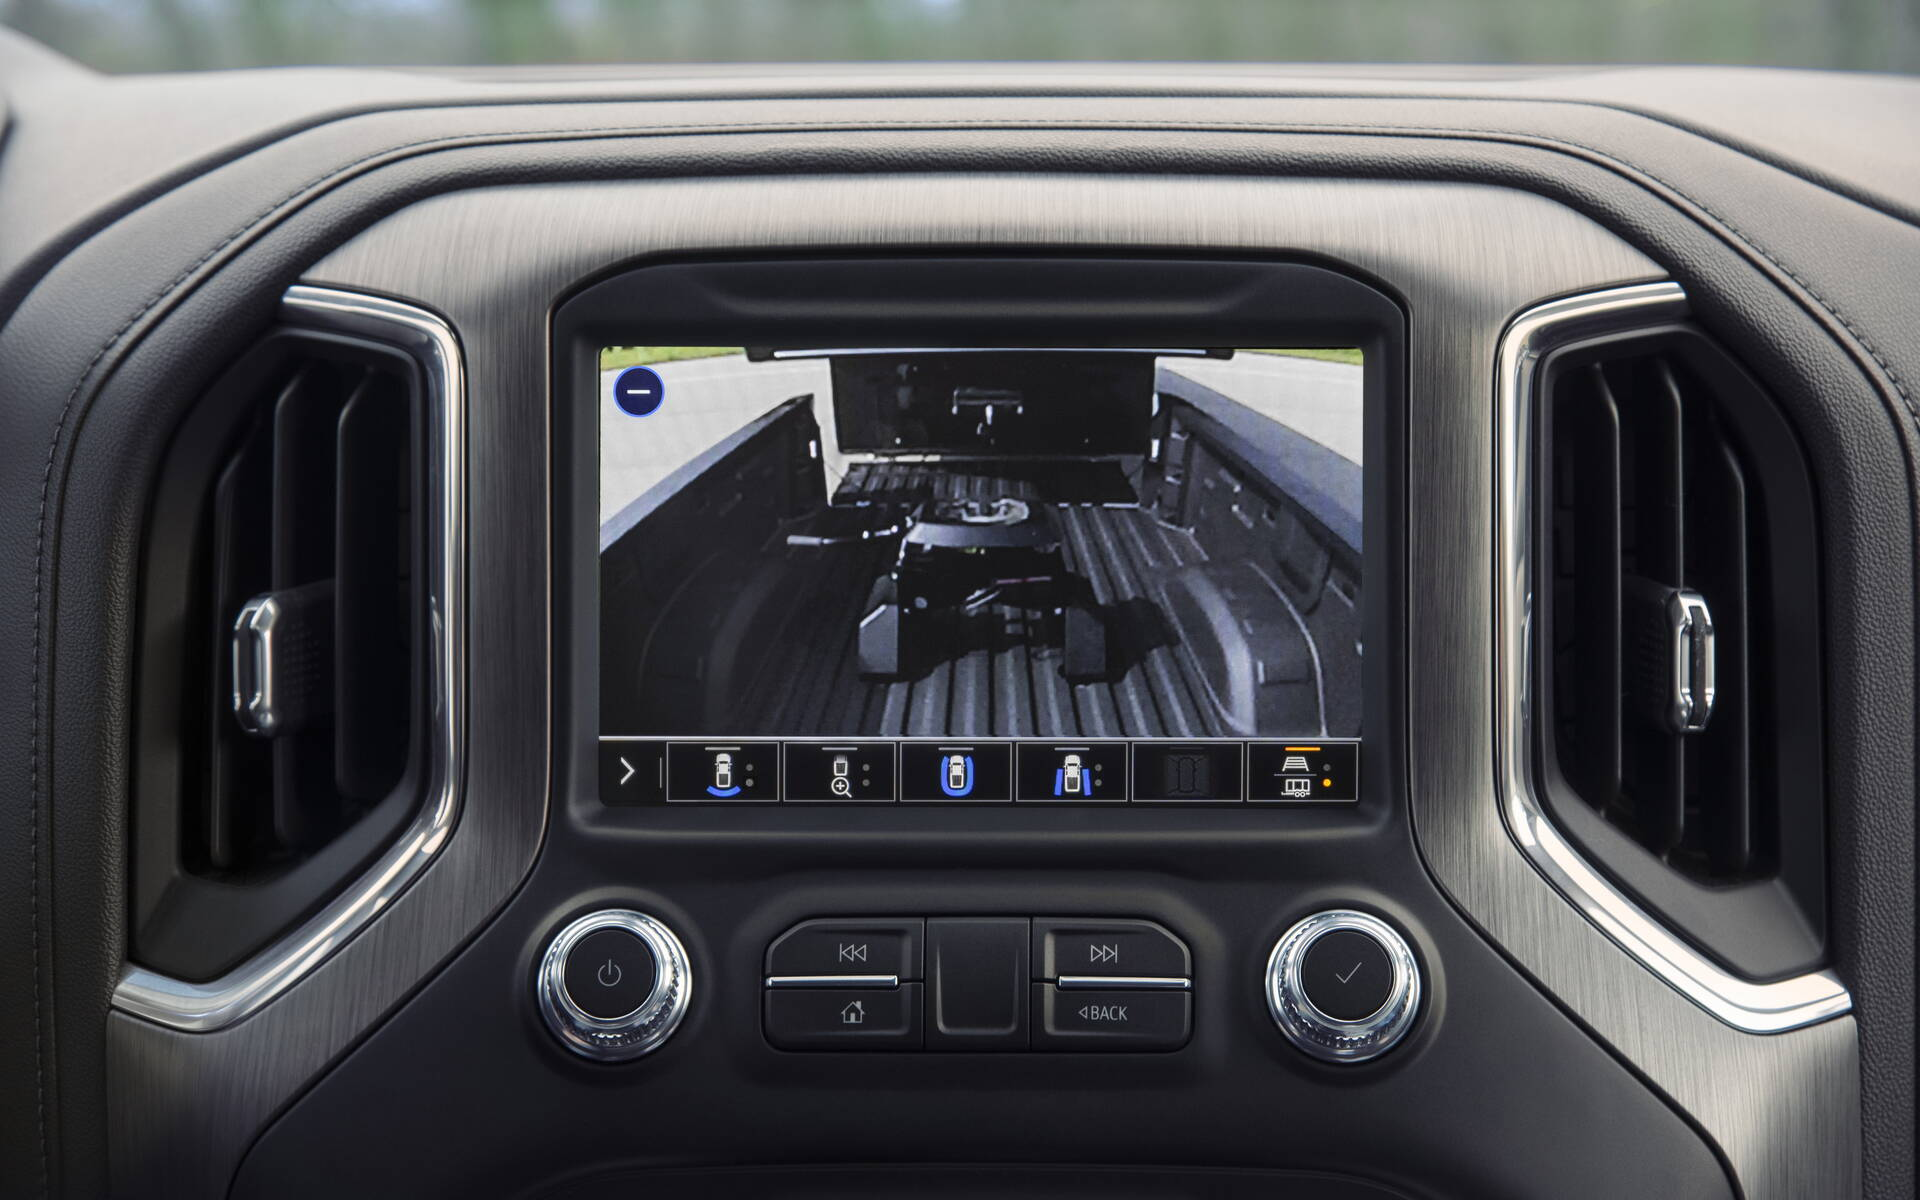 Updated 2021 GMC Sierra Trucks Make Towing Even Easier - 5/11